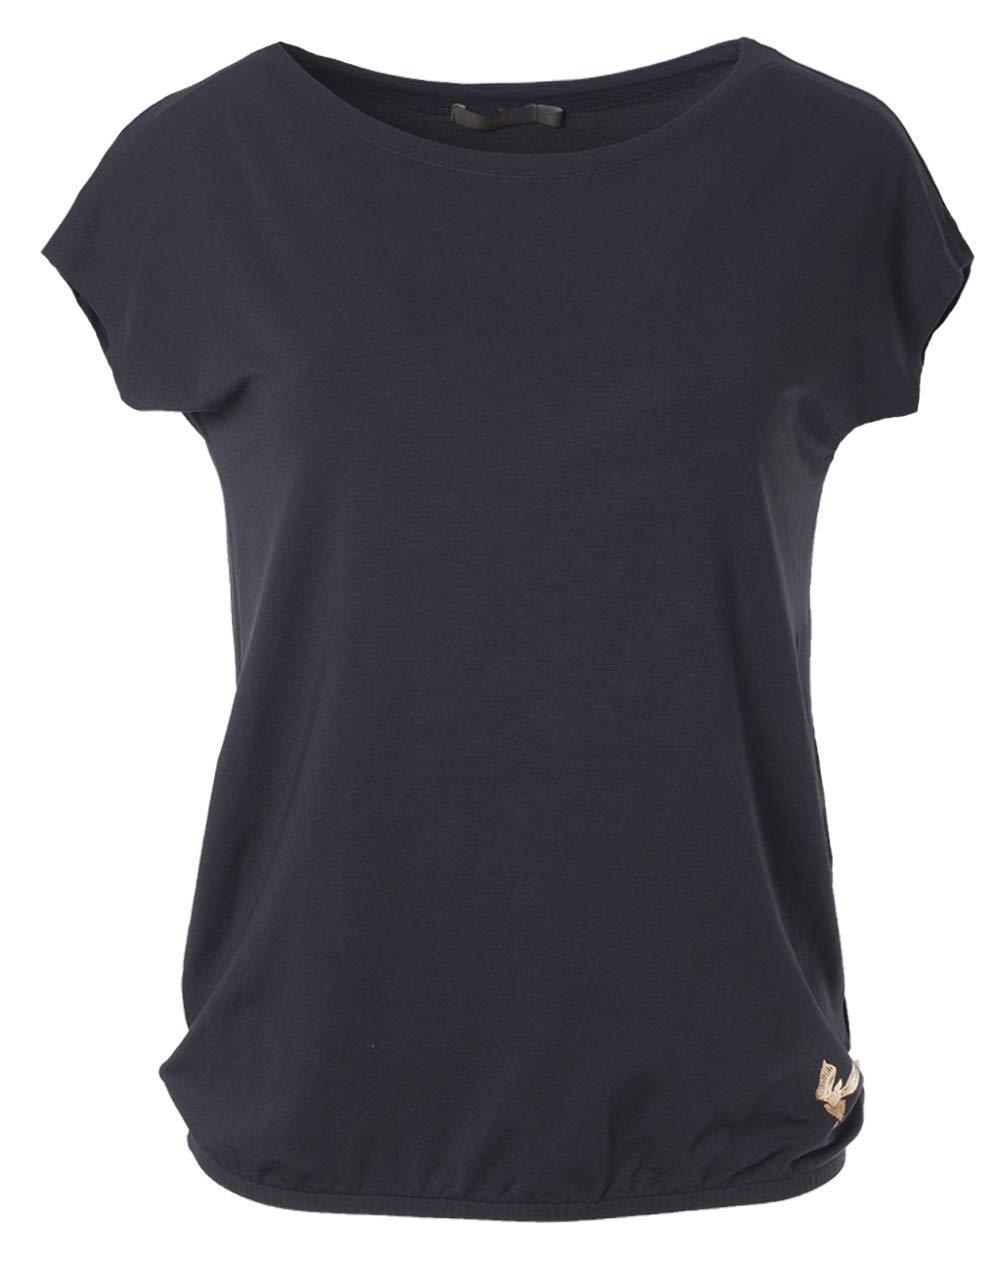 KISMET Yogastyle Yoga-t-Shirt Varuna - Anthracite